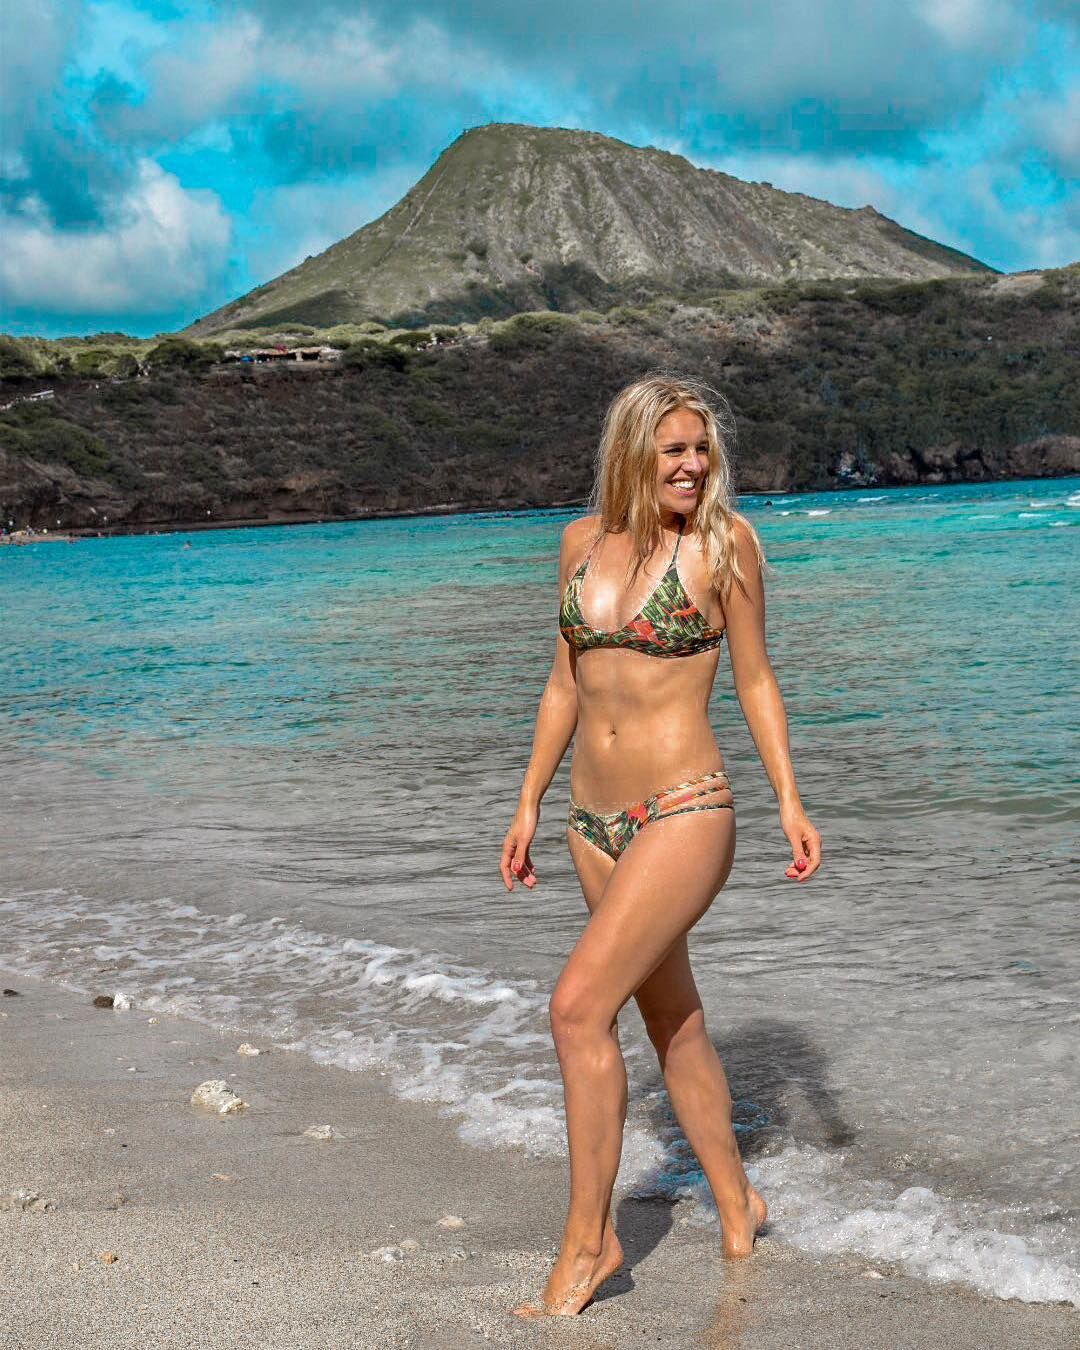 Exploring After Snorkeling In My New Favorite Bikini I